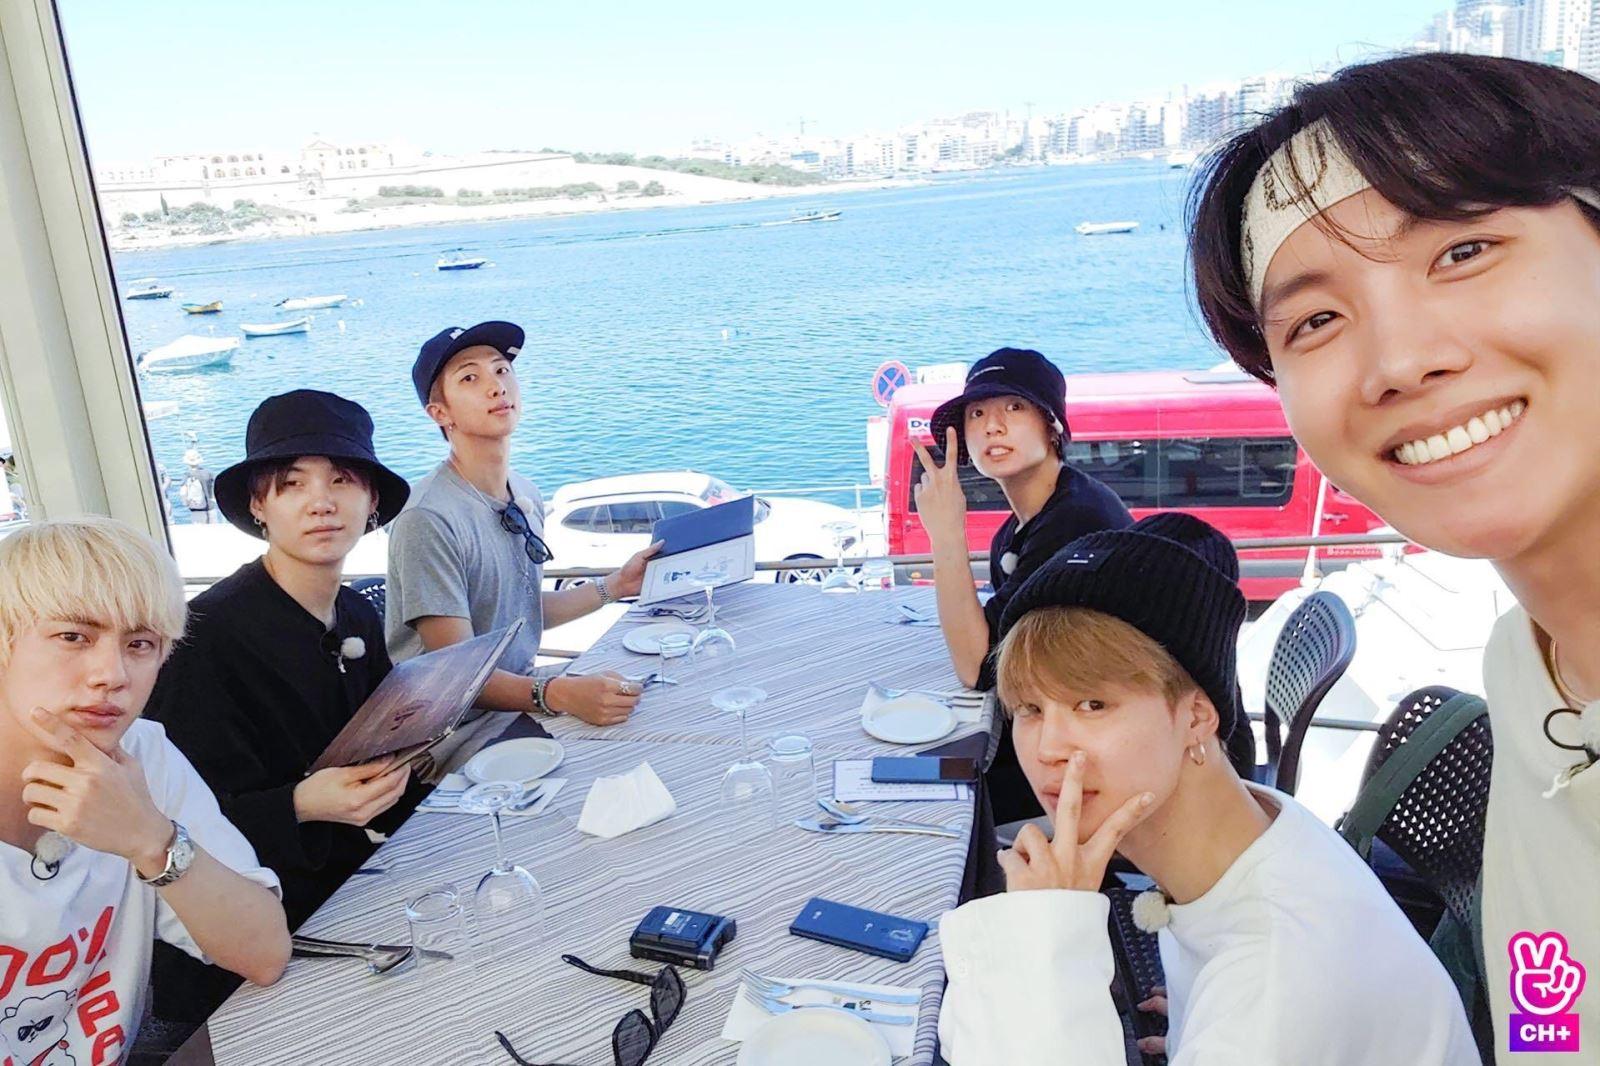 BTS, Bon Voyage BTS mùa 4, xem Bon Voyage BTS 2019, link xem Bon Voyage, show thực tế BTS, tin tức BTS, xem show bon voyage, Big Hit, ảnh BTS